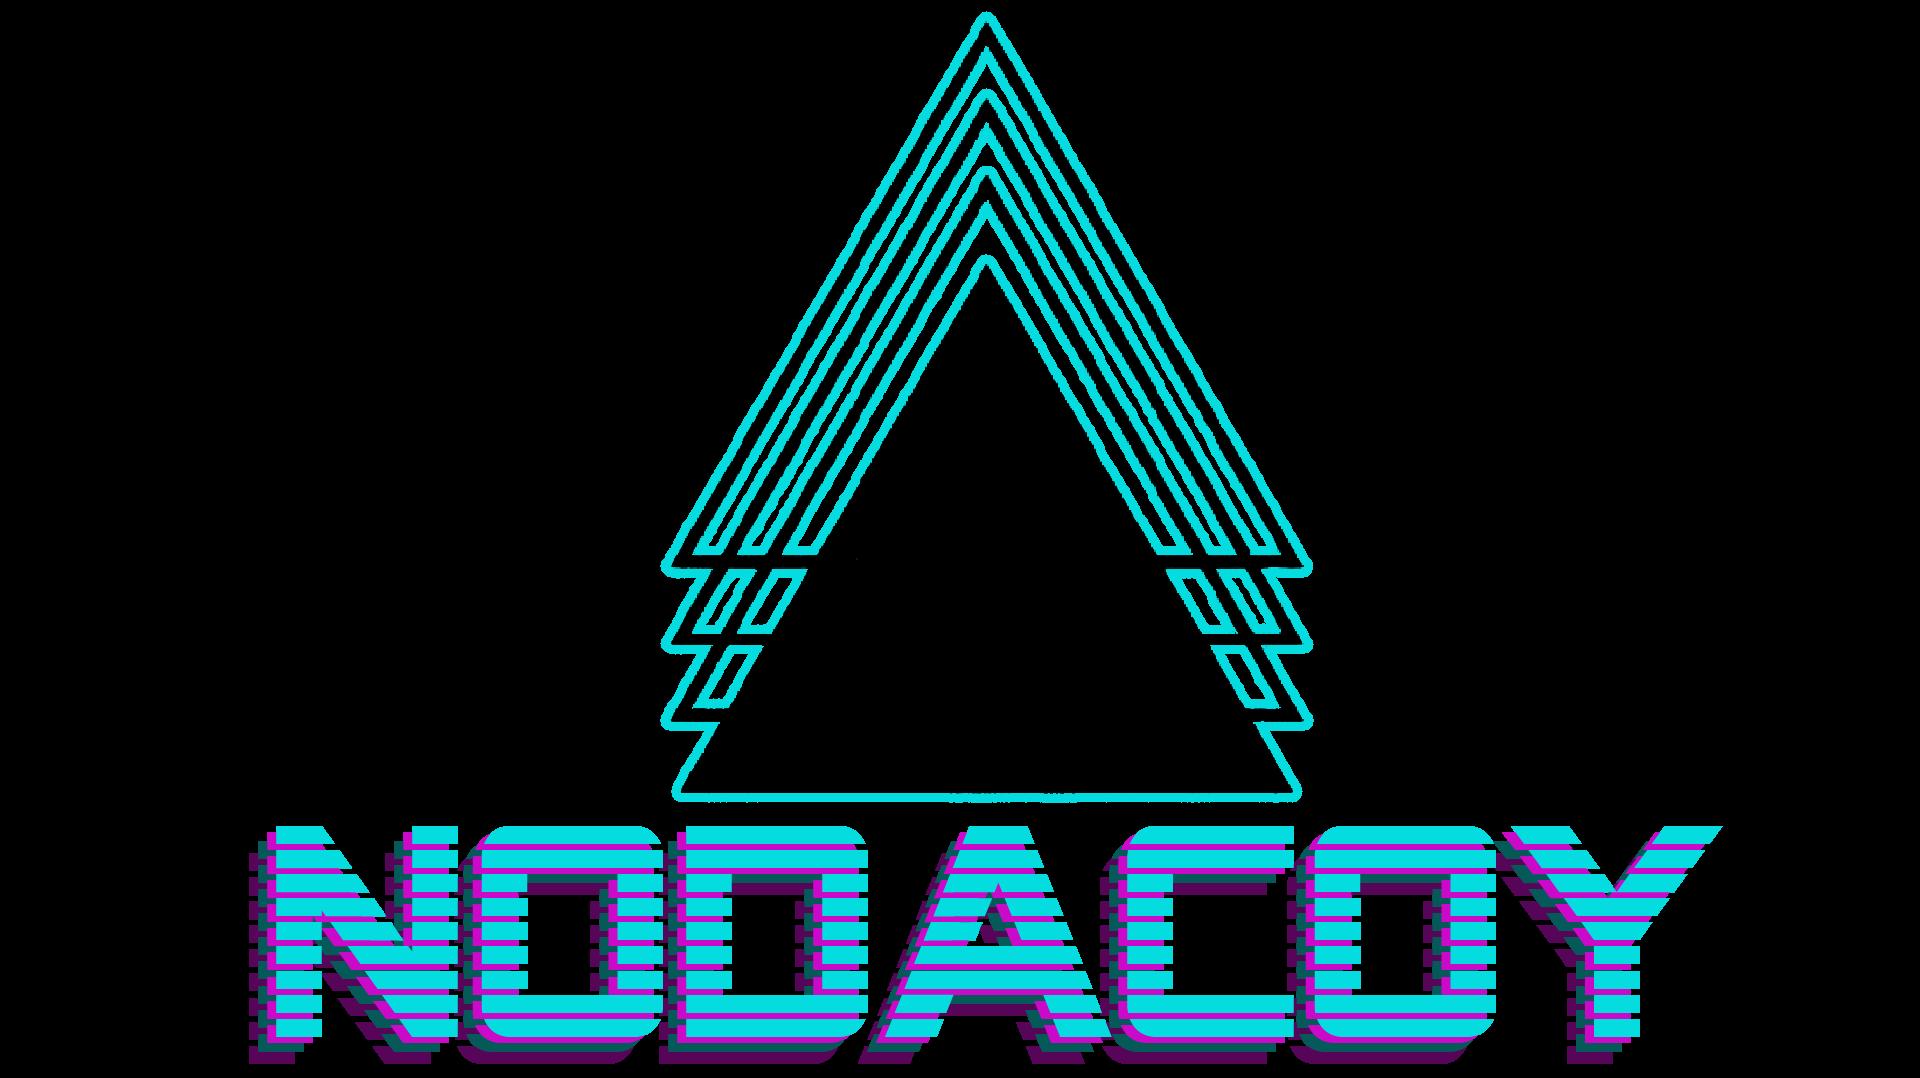 Nodacoy Games